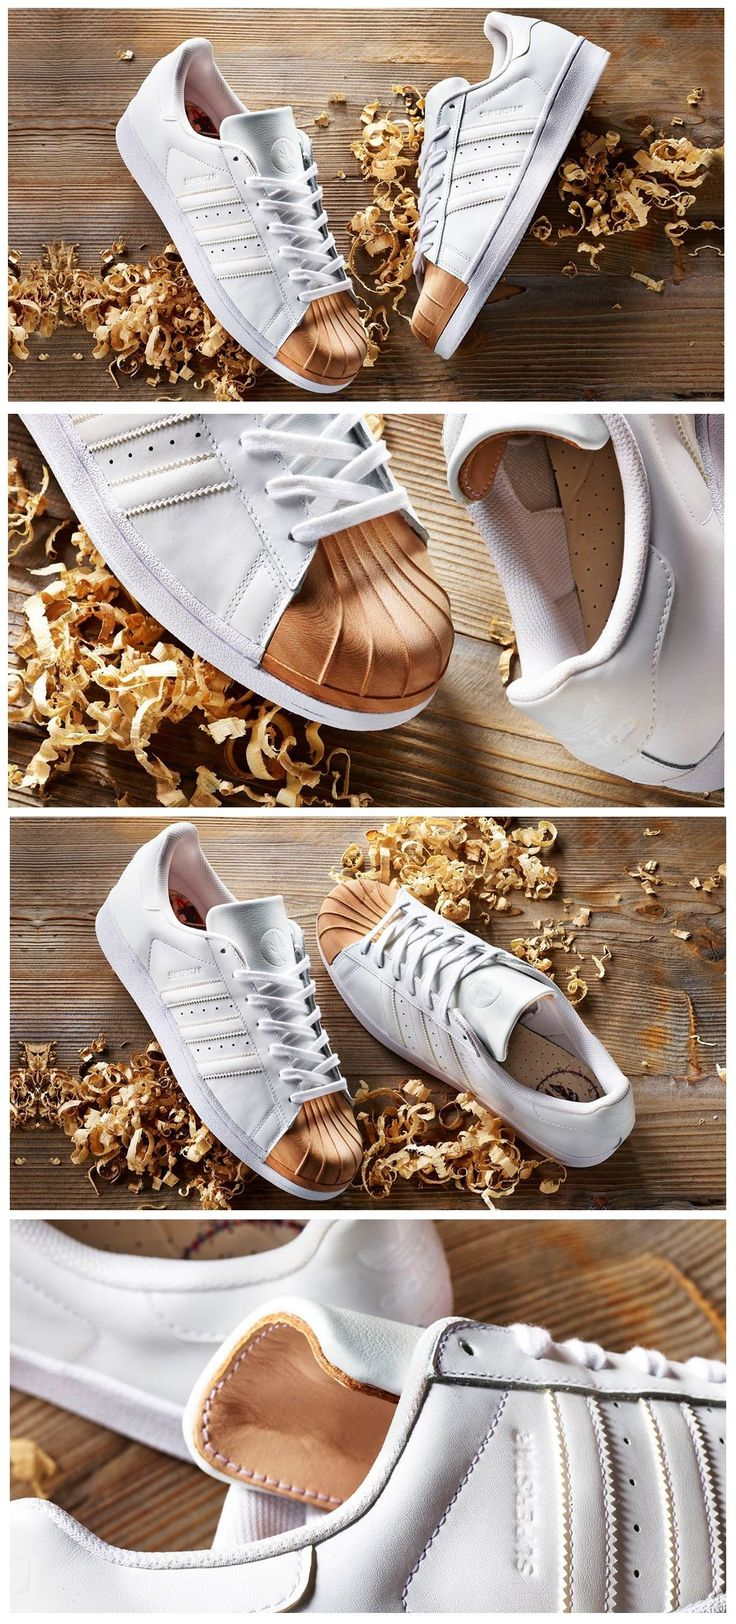 Afew x Ivan Beslic x adidas Originals Superstar